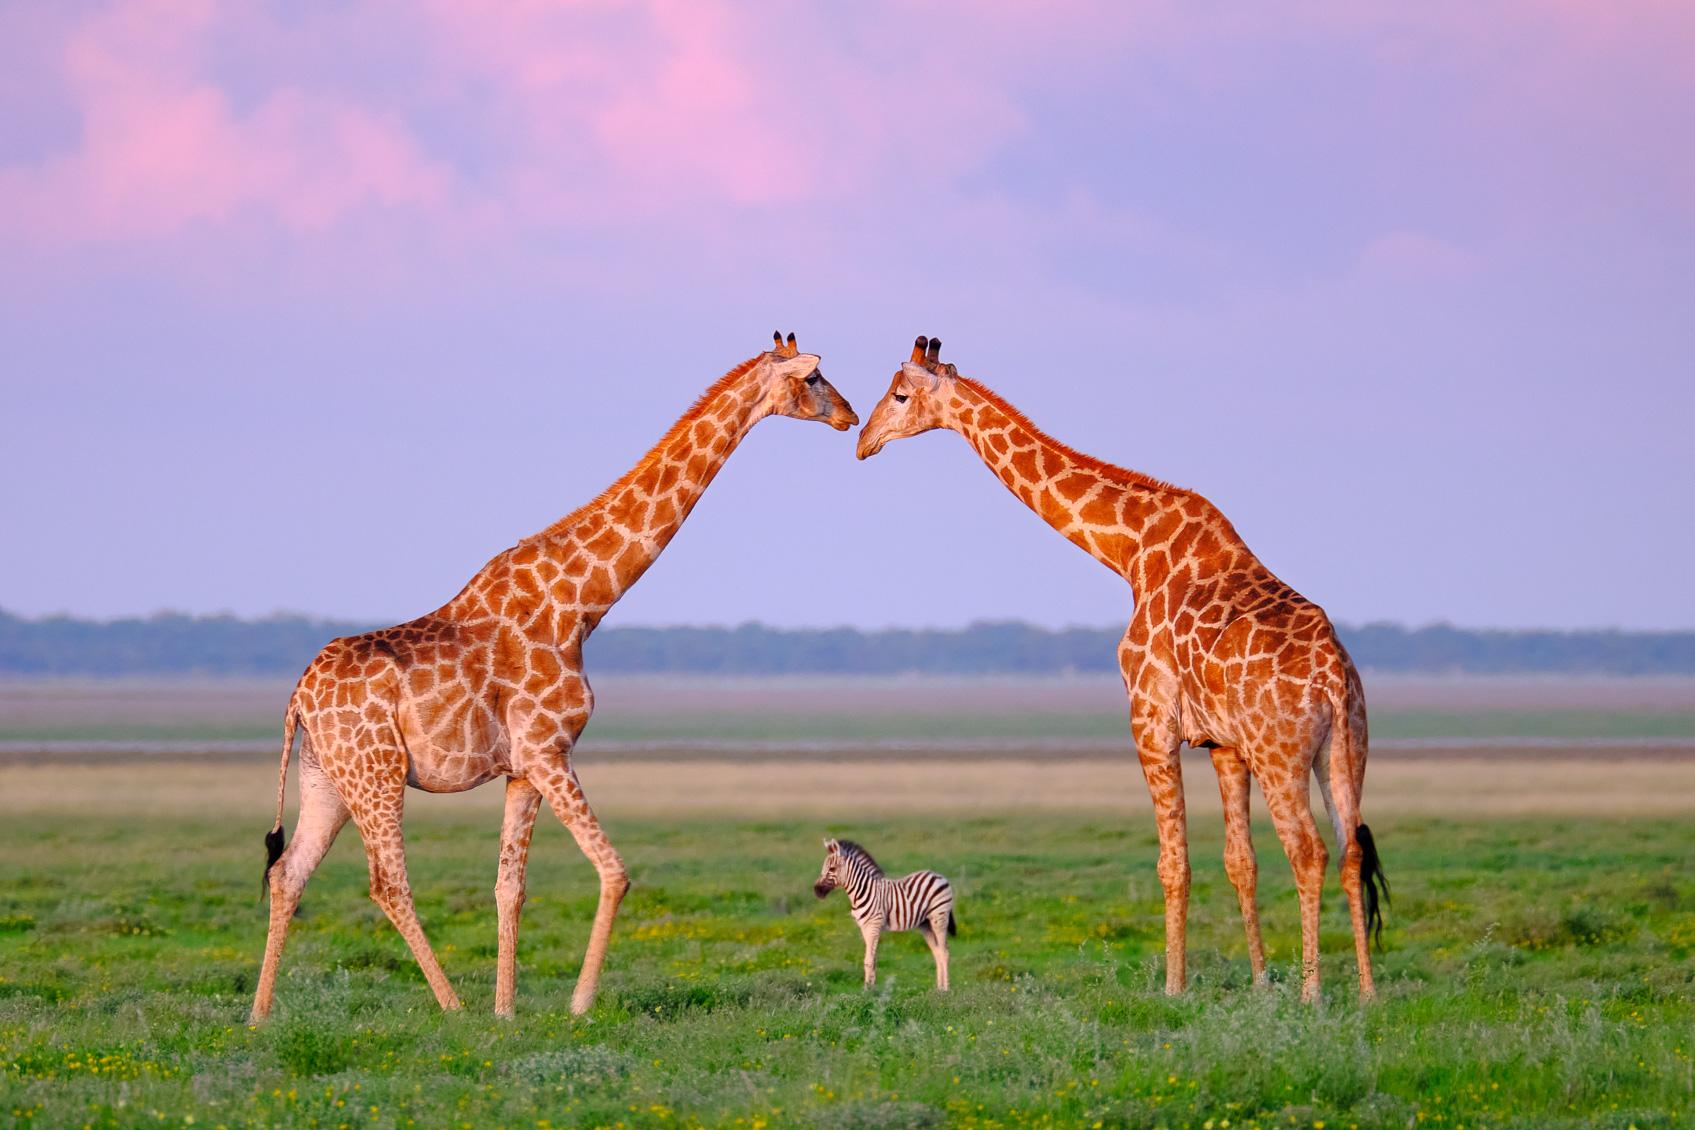 Giraffes Archway For A Zebra Foal Wildlife Photography